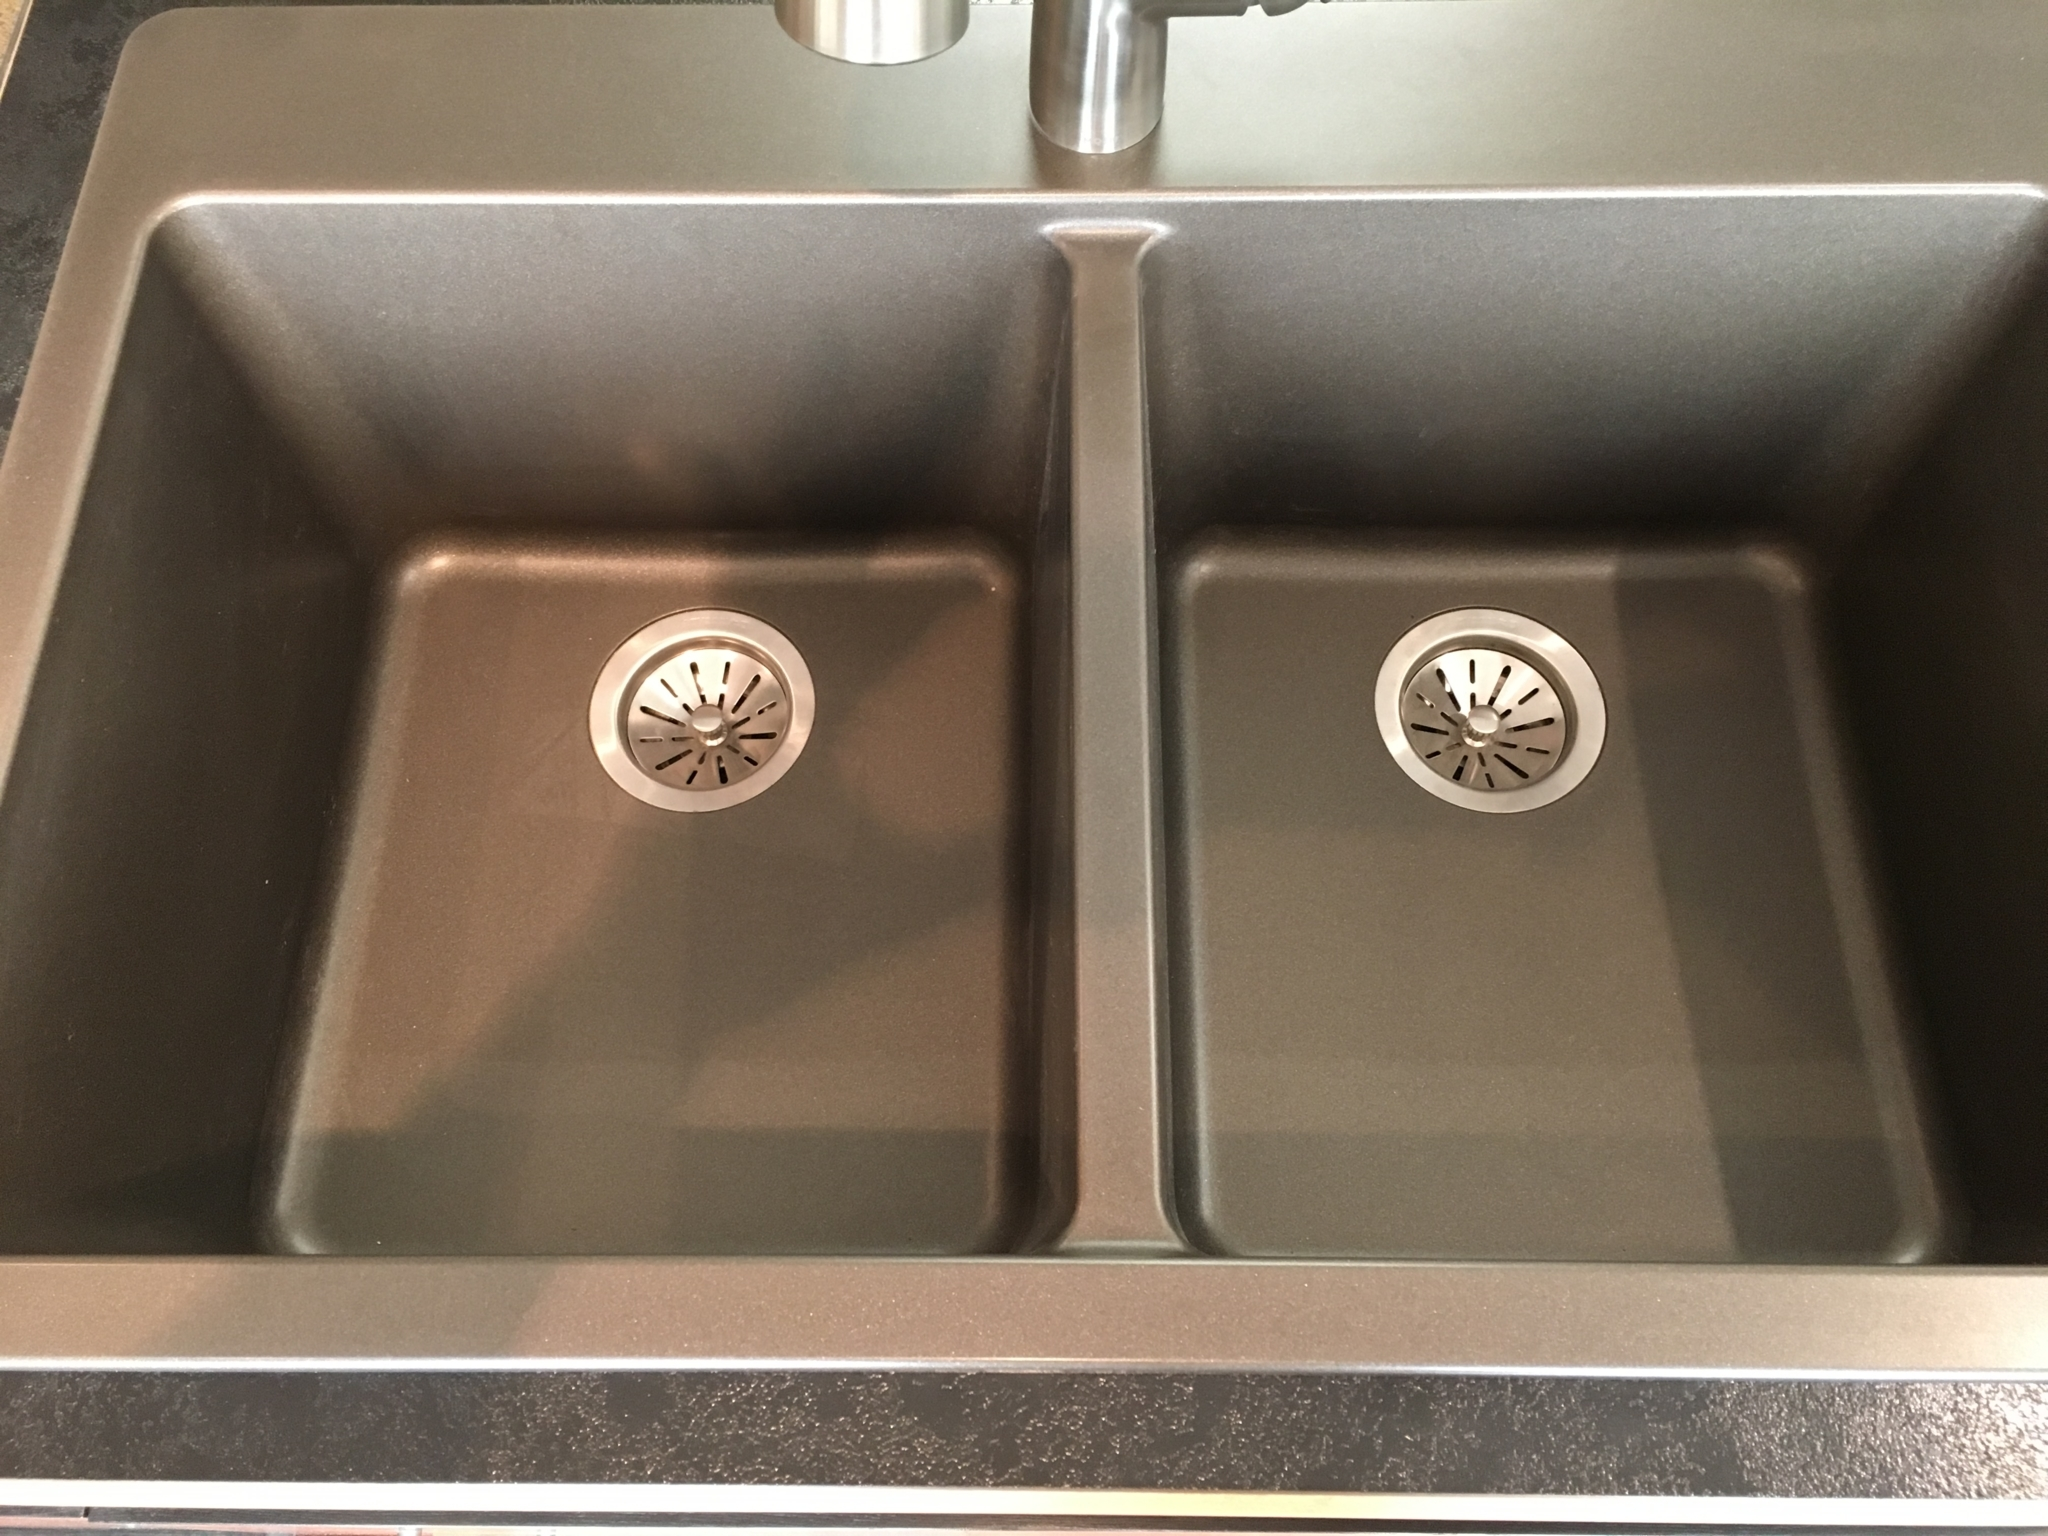 Burgess Plumbing Heating & Electrical Co Ltd in Williams Lake: kitchen sink